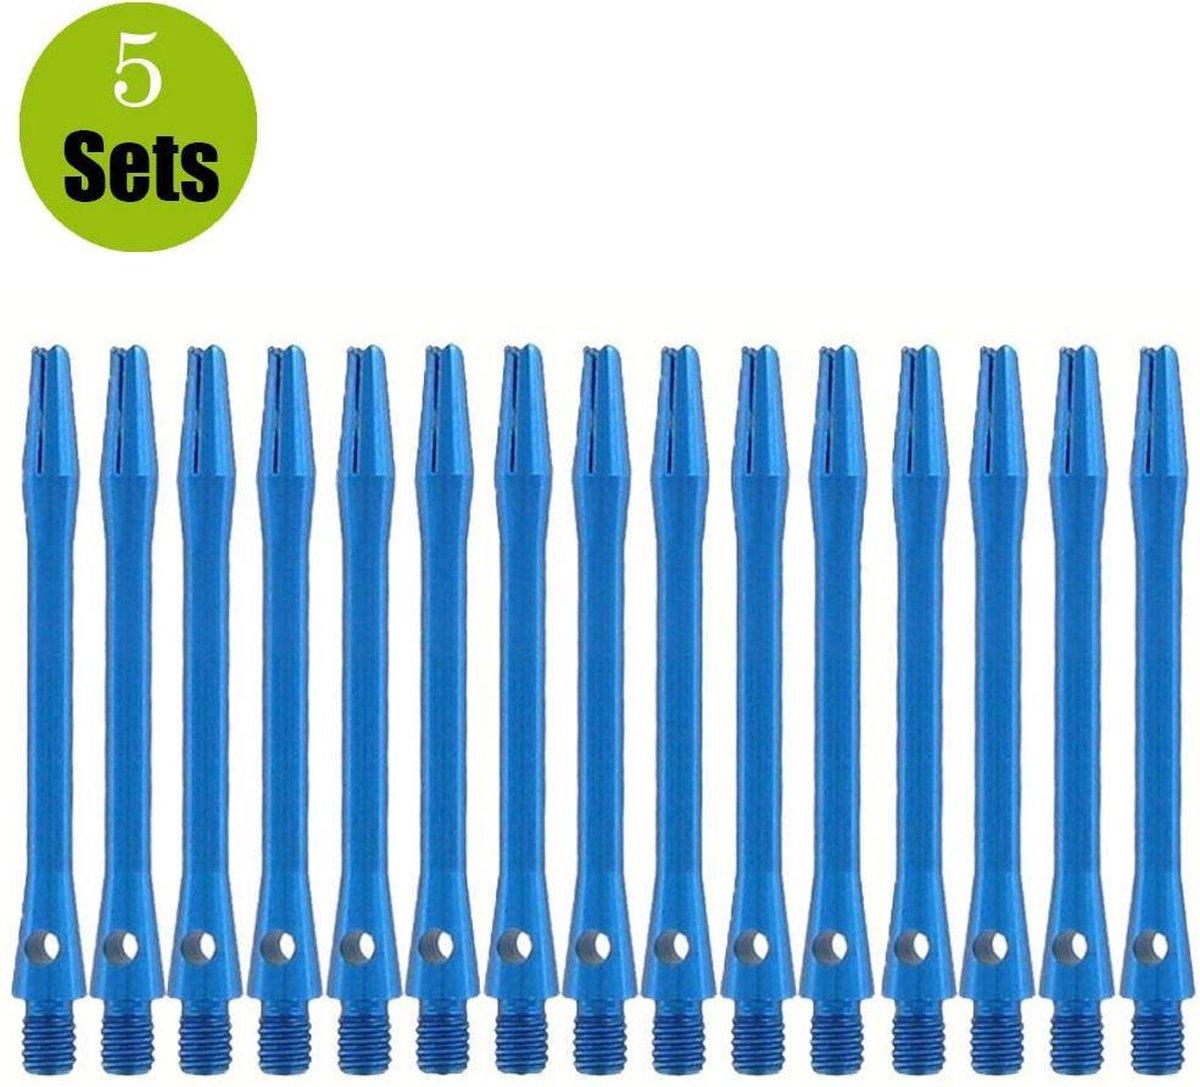 Aluminium Dart Shafts - Blauw - Medium - (5 Sets)